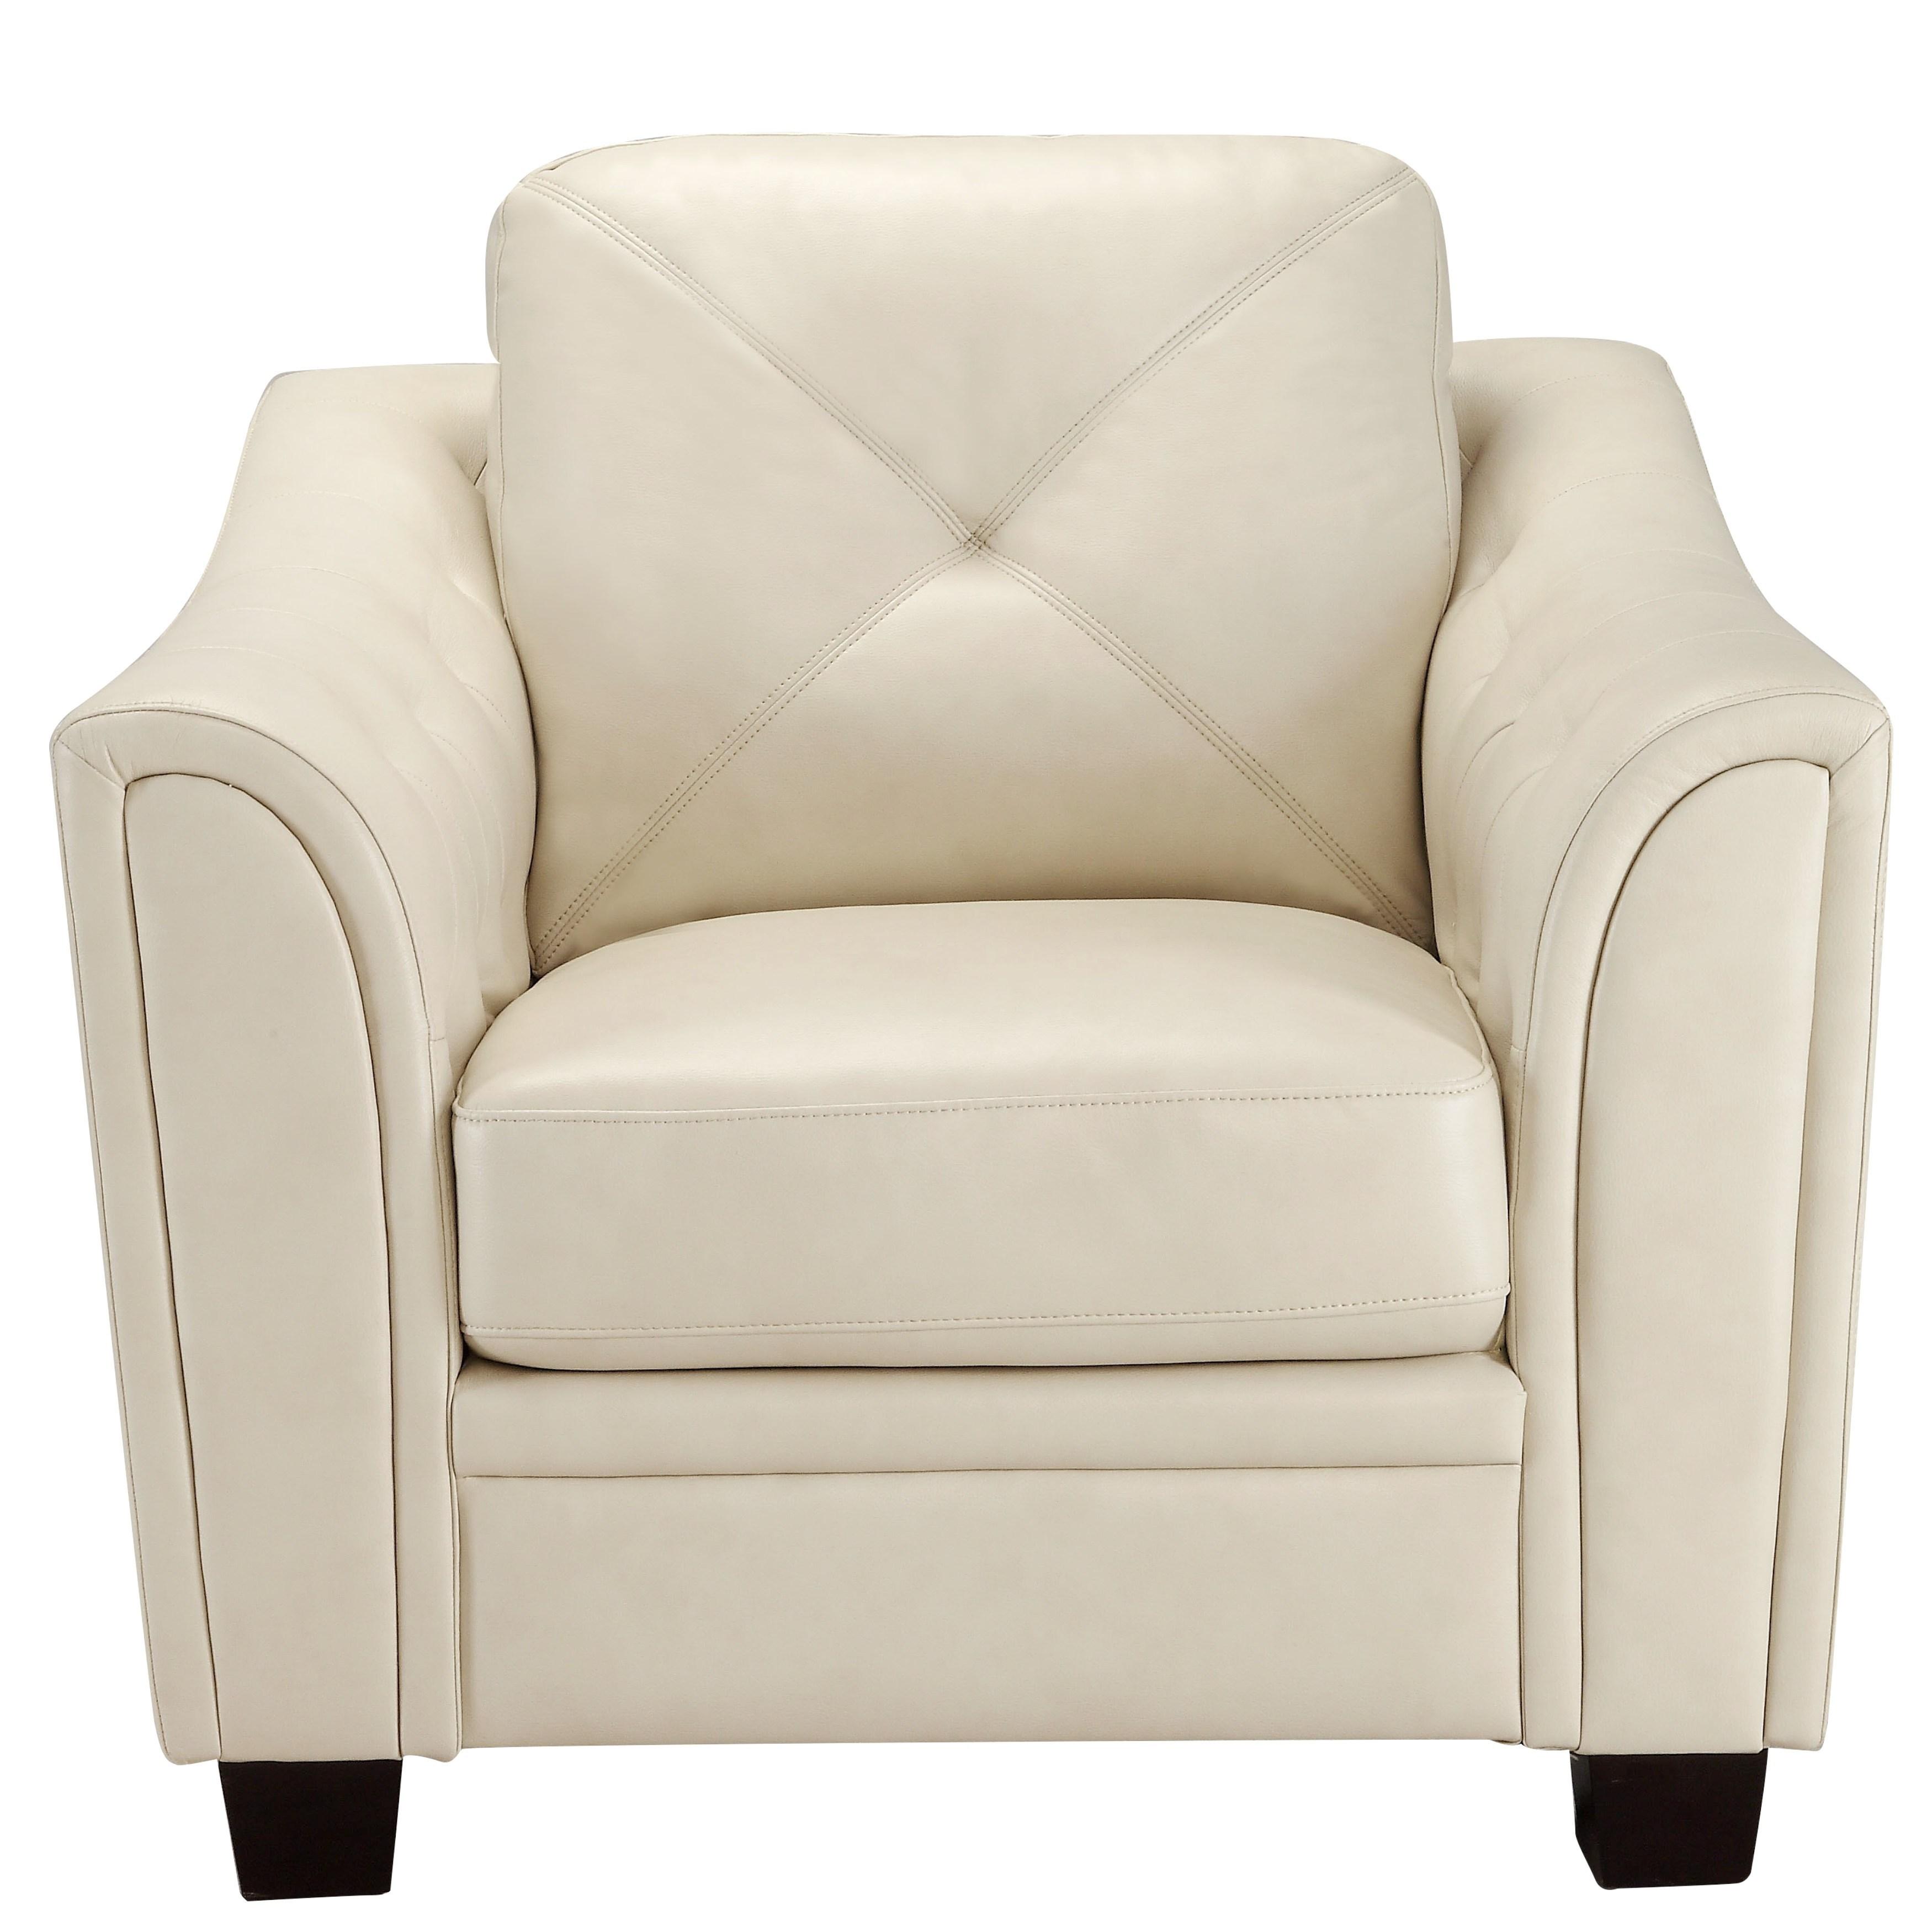 Shop Lacasta Mid Century Modern Tufted Design Cream Living Room Sofa ...